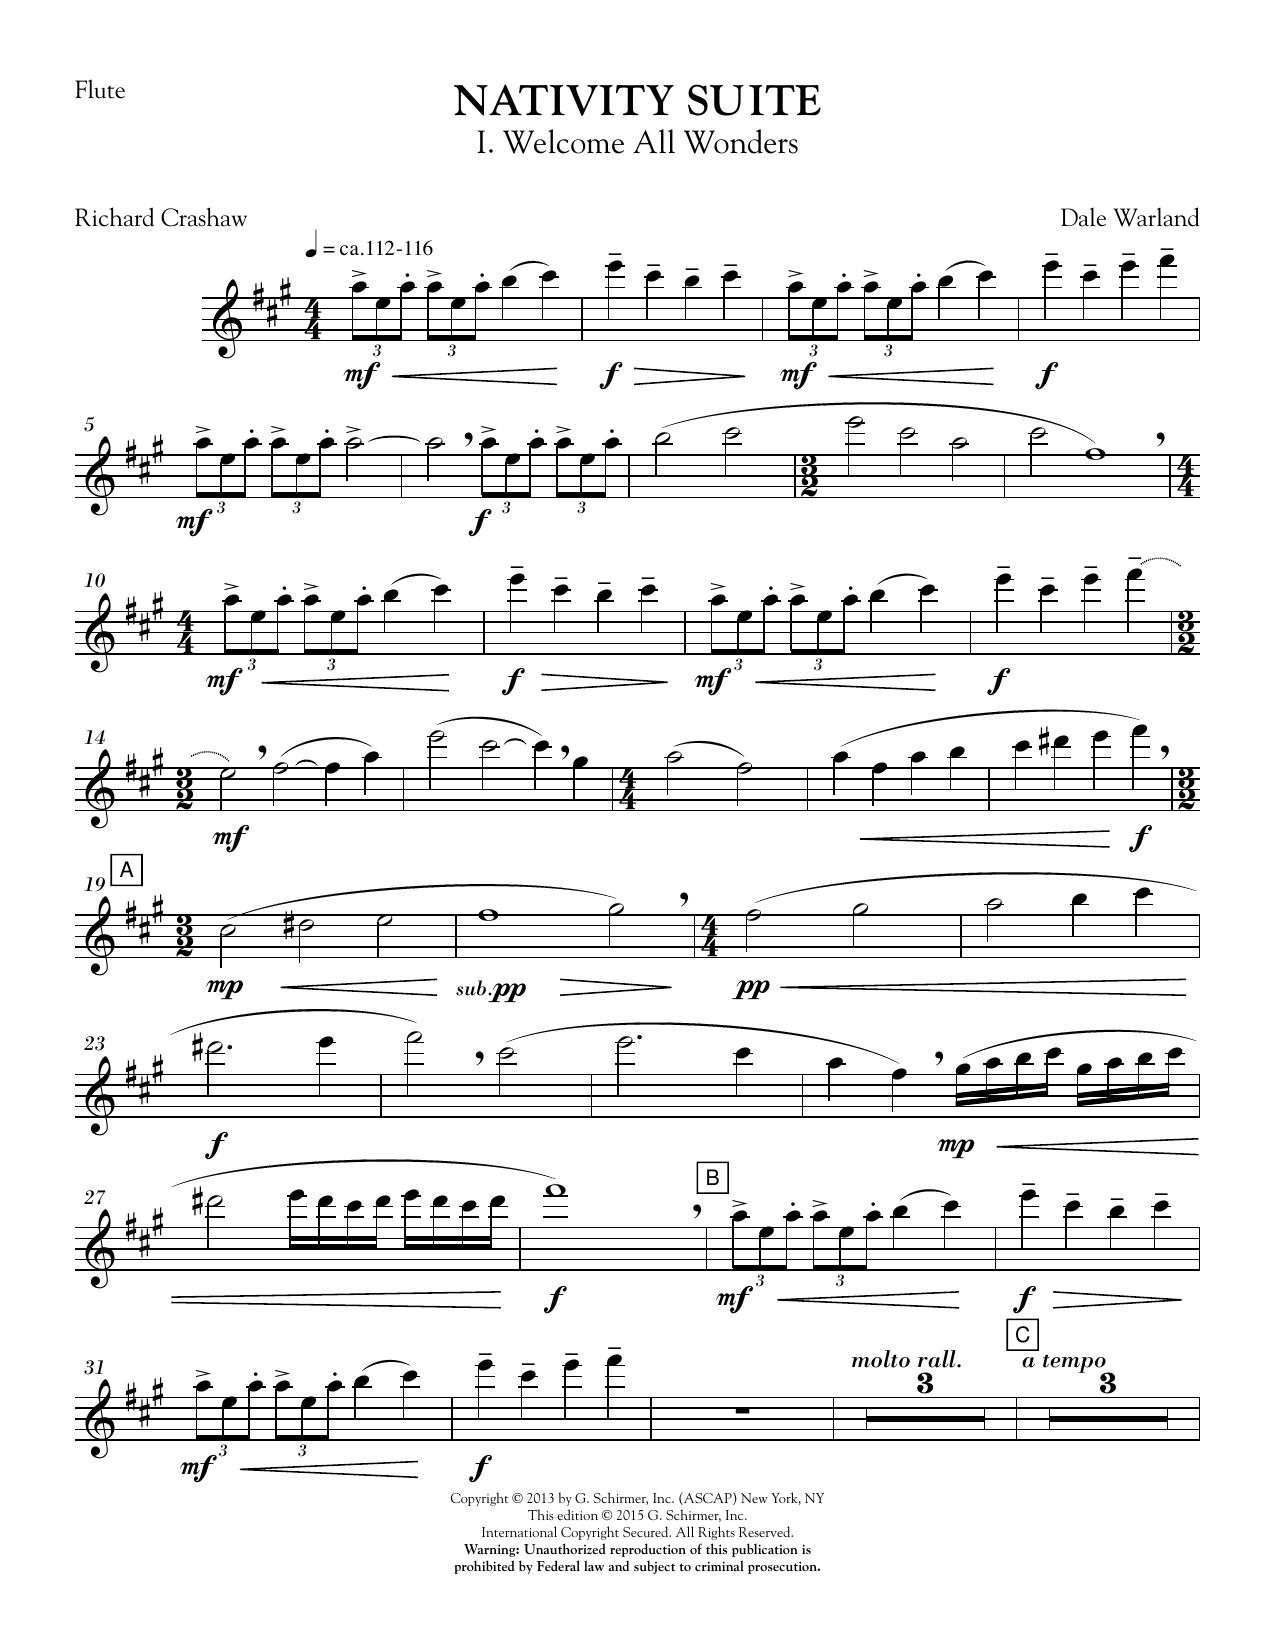 Nativity Suite - Flute sheet music